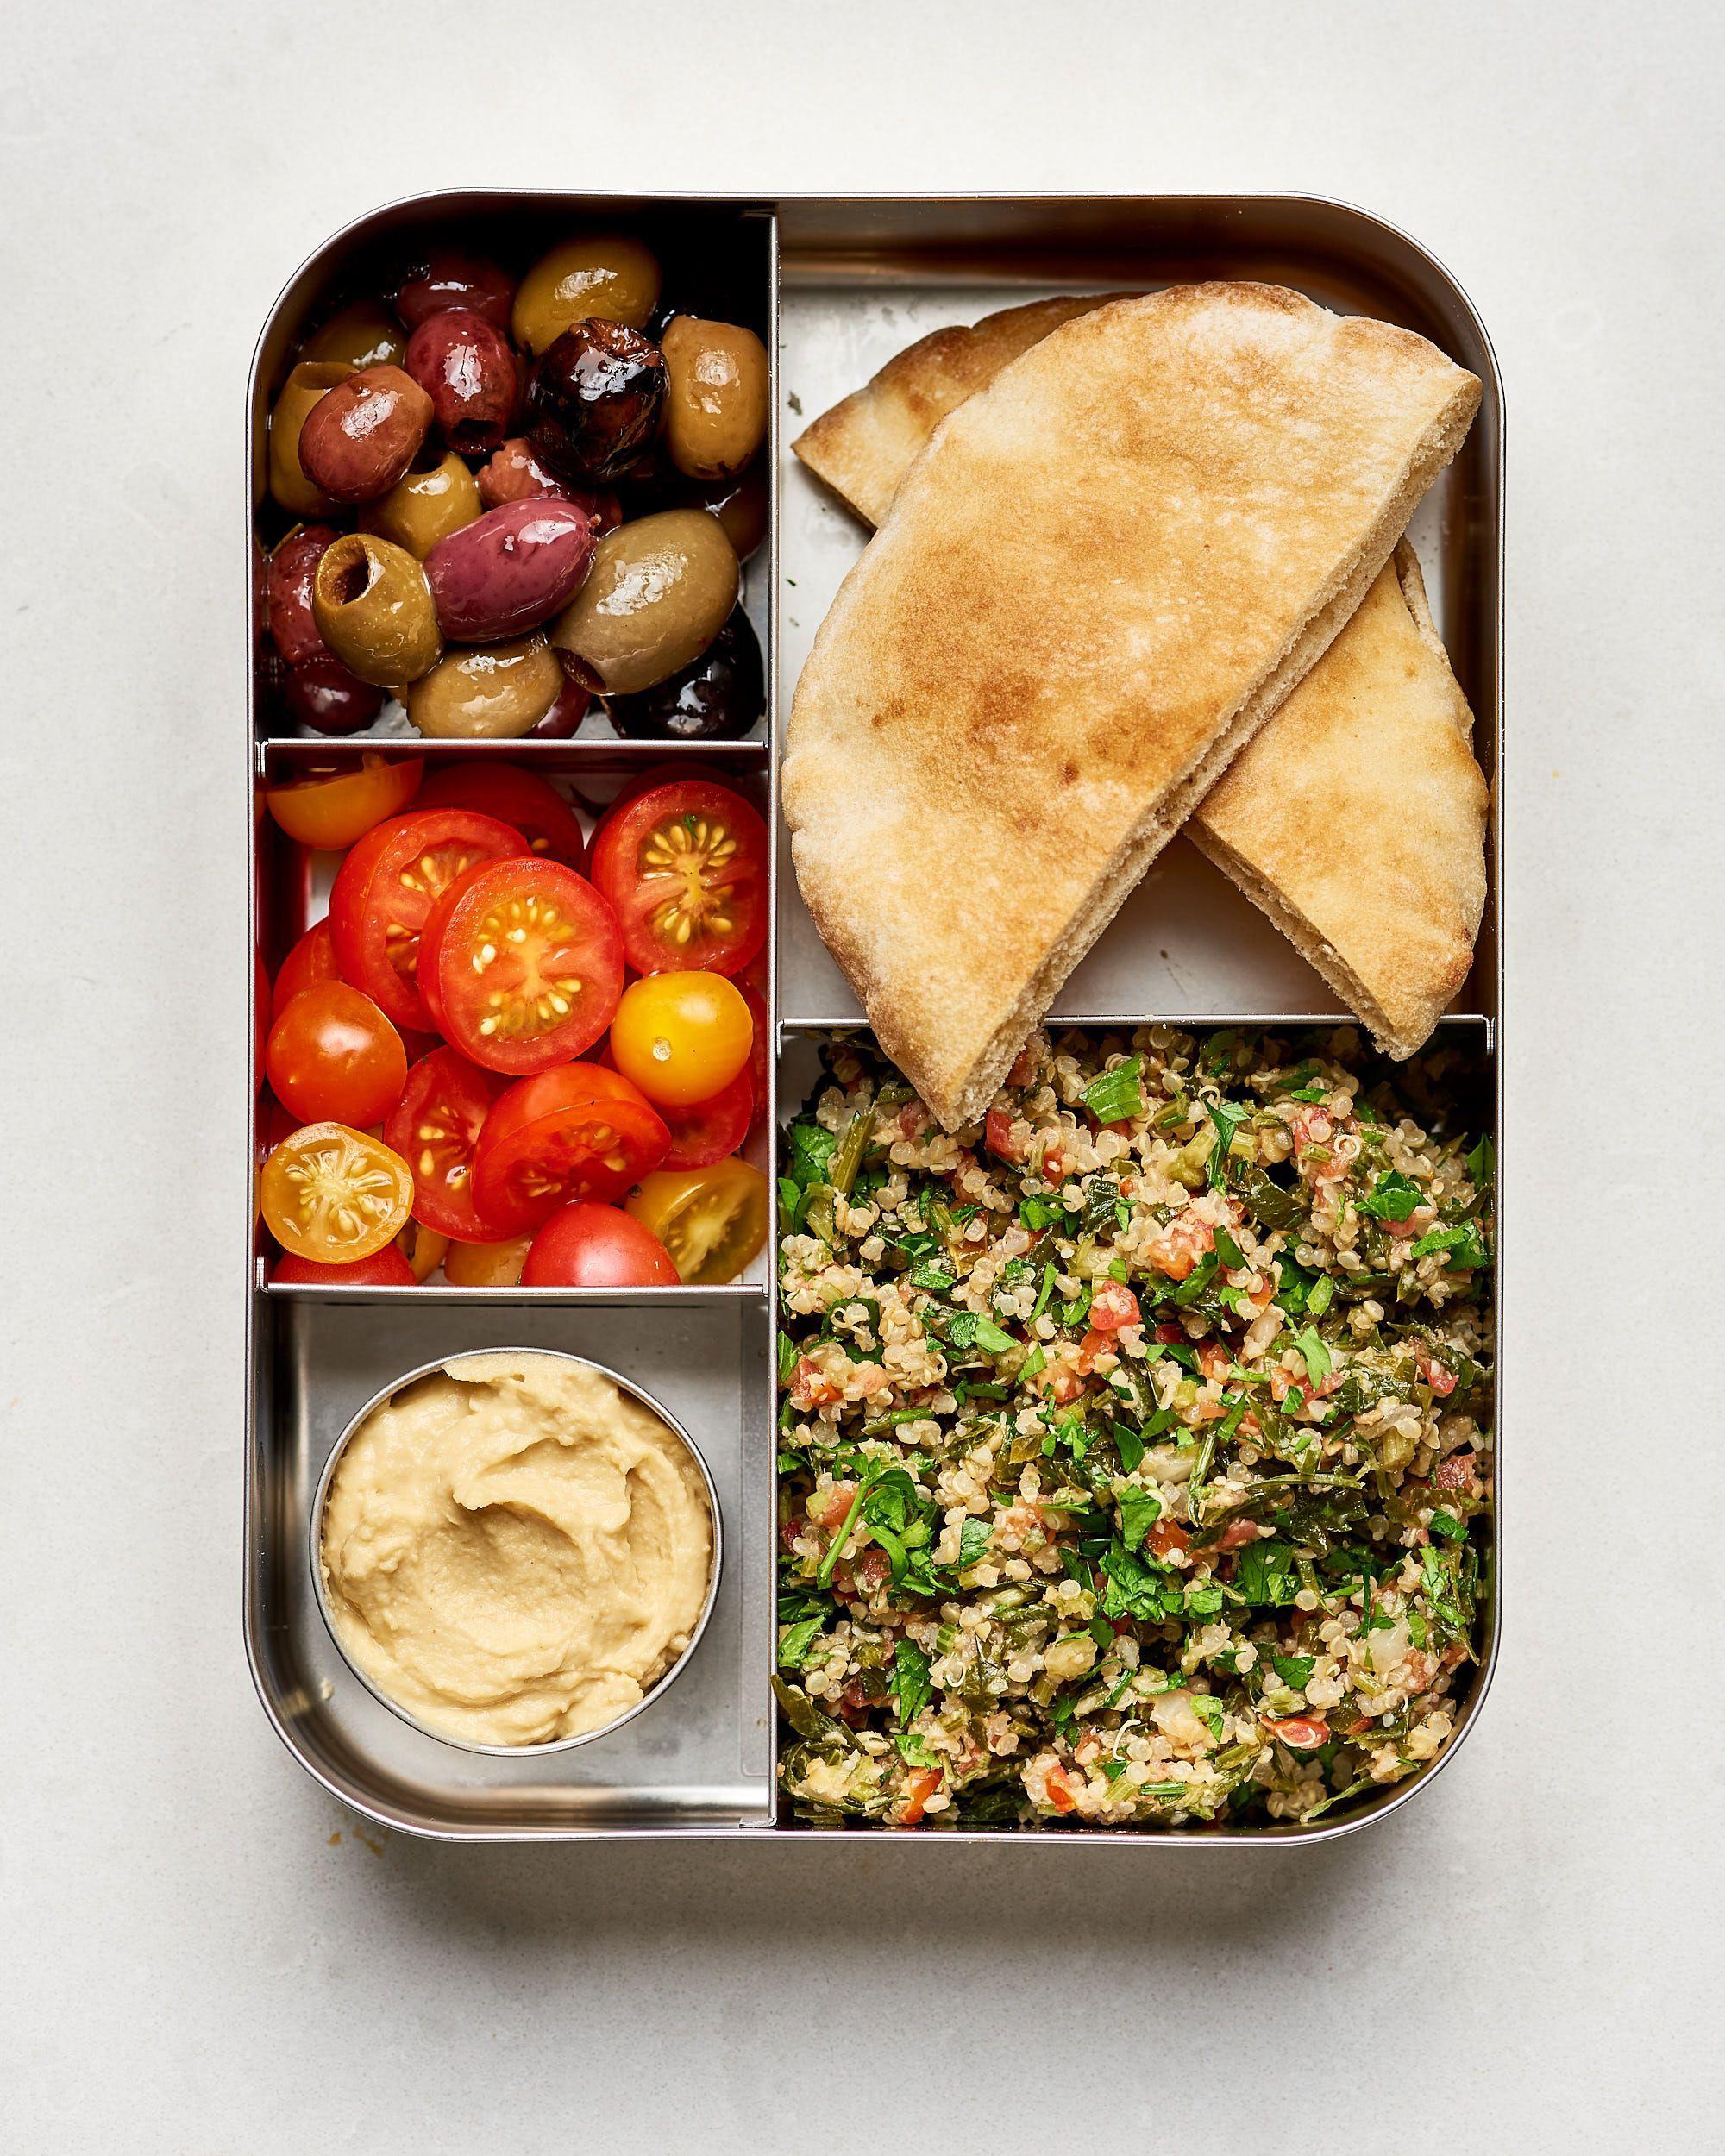 10 easy vegan lunch box ideas paleo images